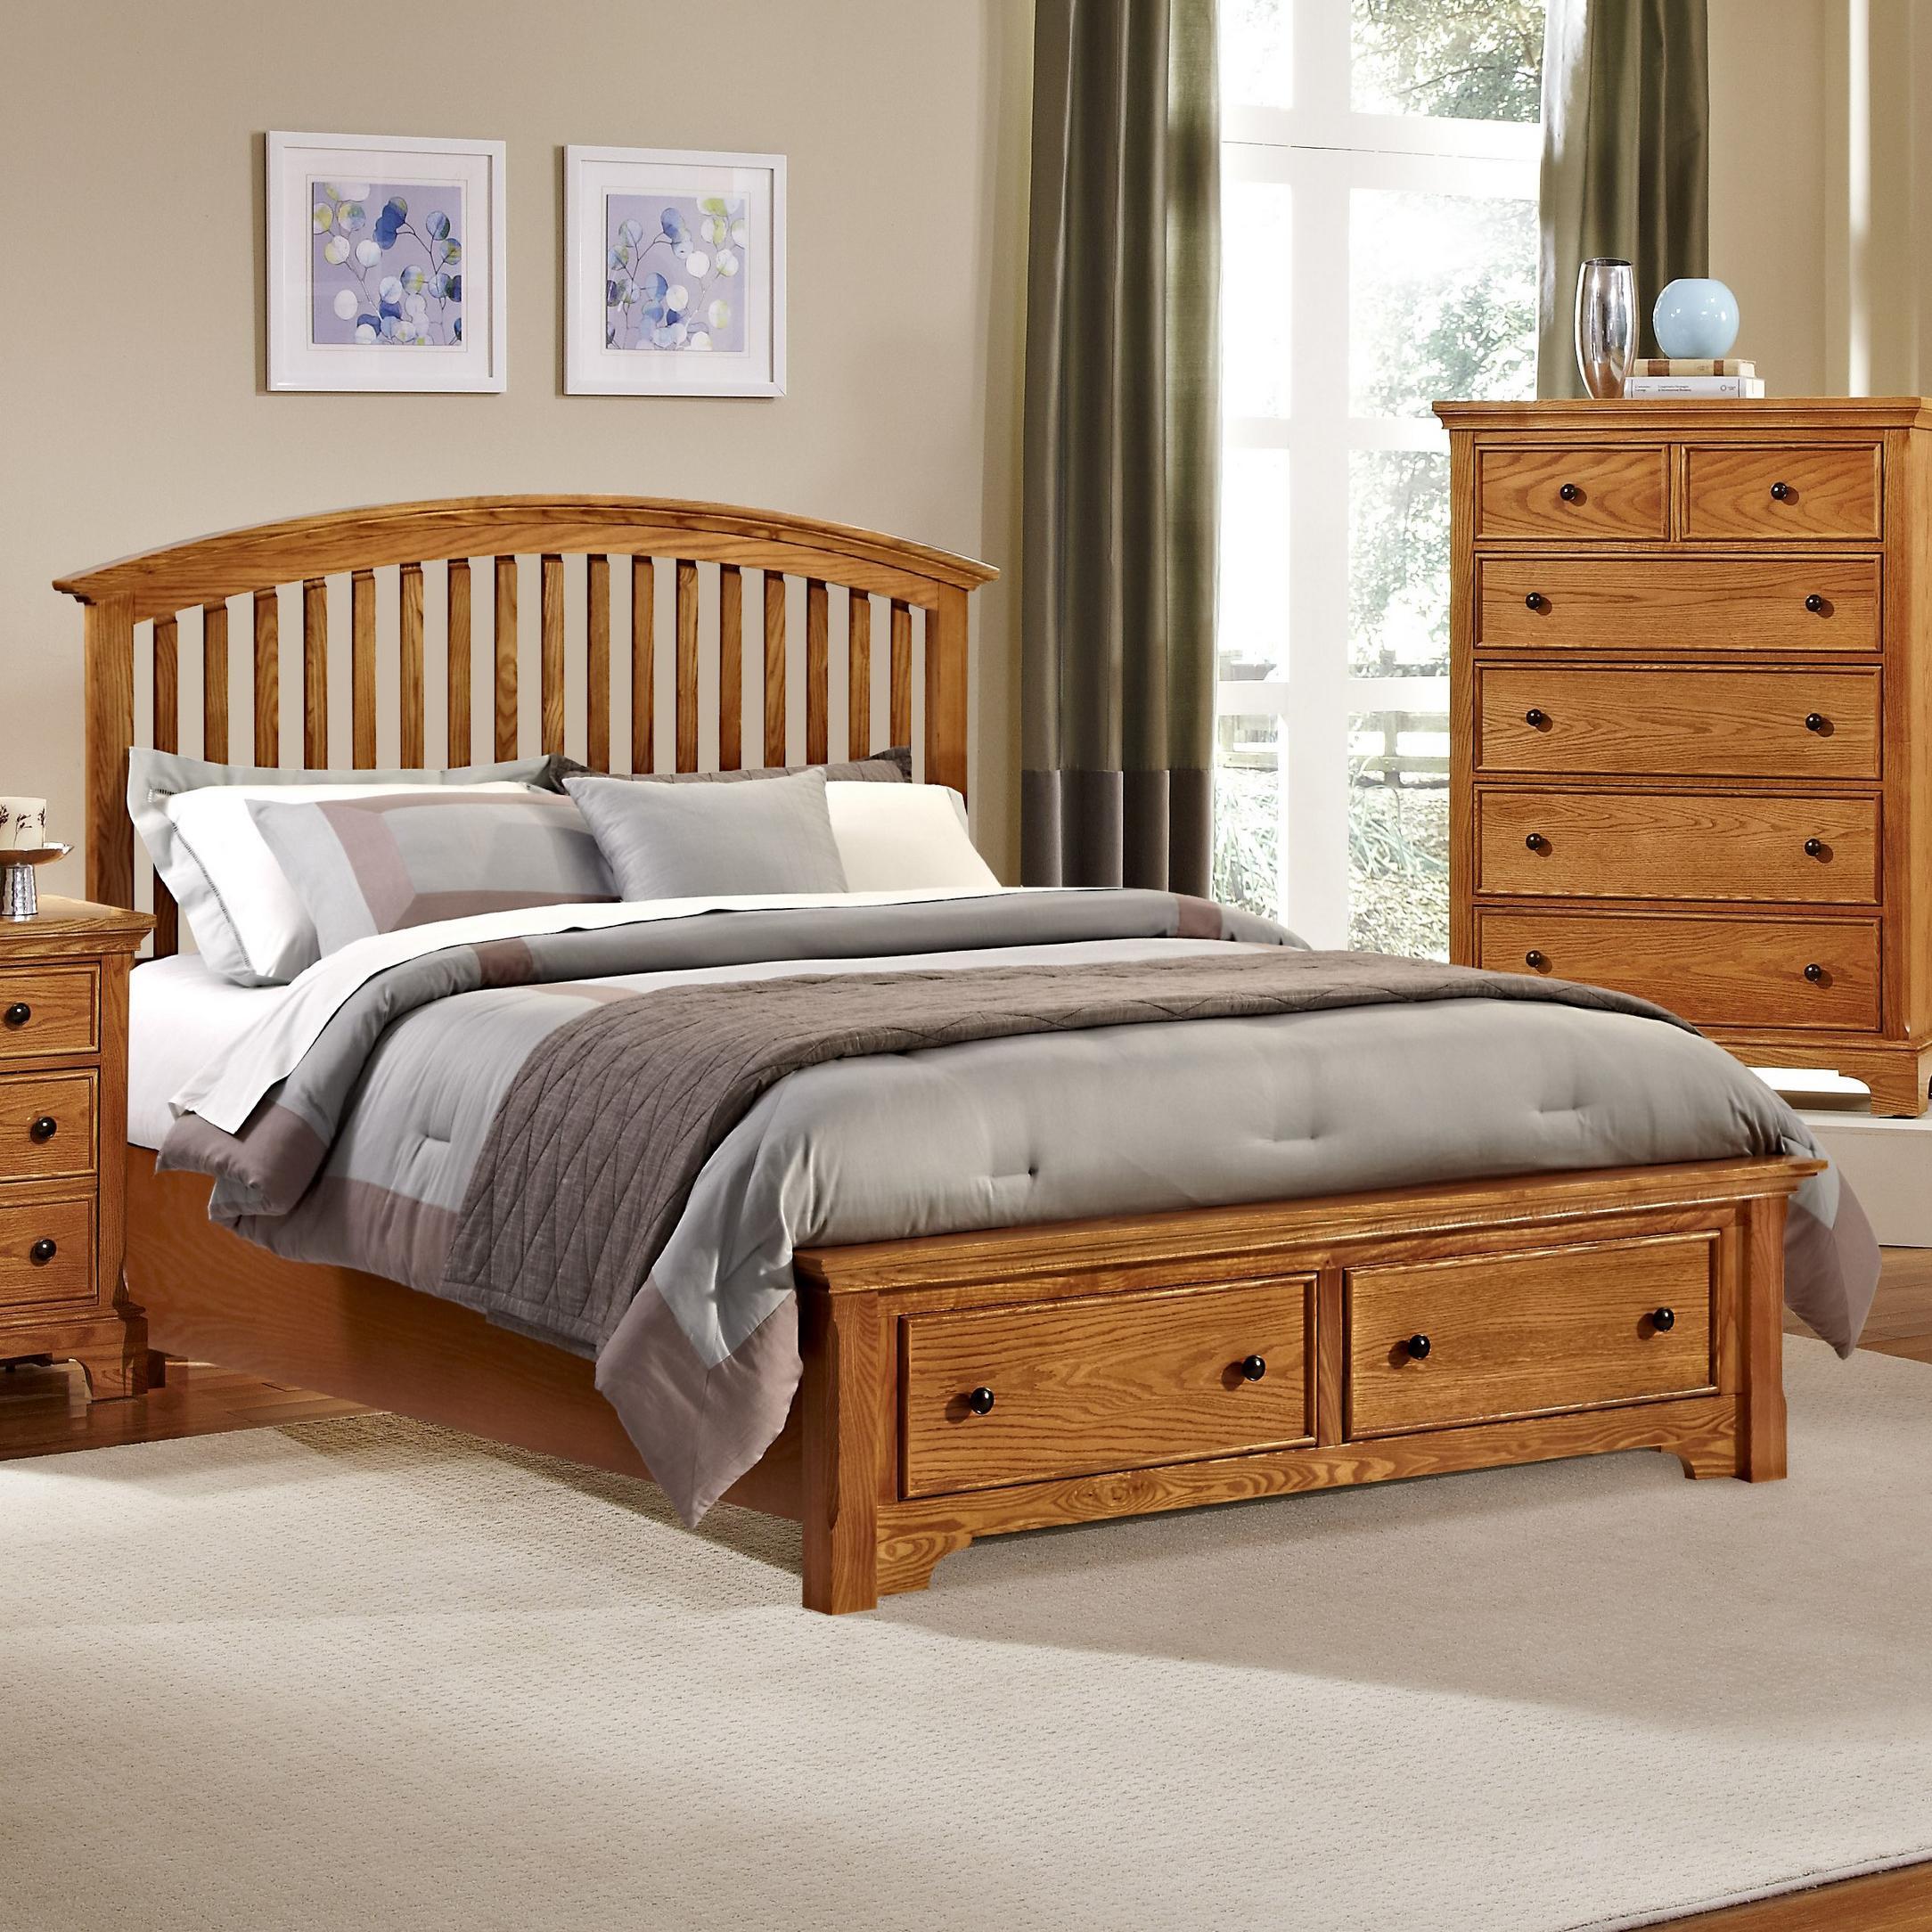 Vaughan Bassett Forsyth King Arched Storage Bed - Item Number: BB75-669+066B+502+666T